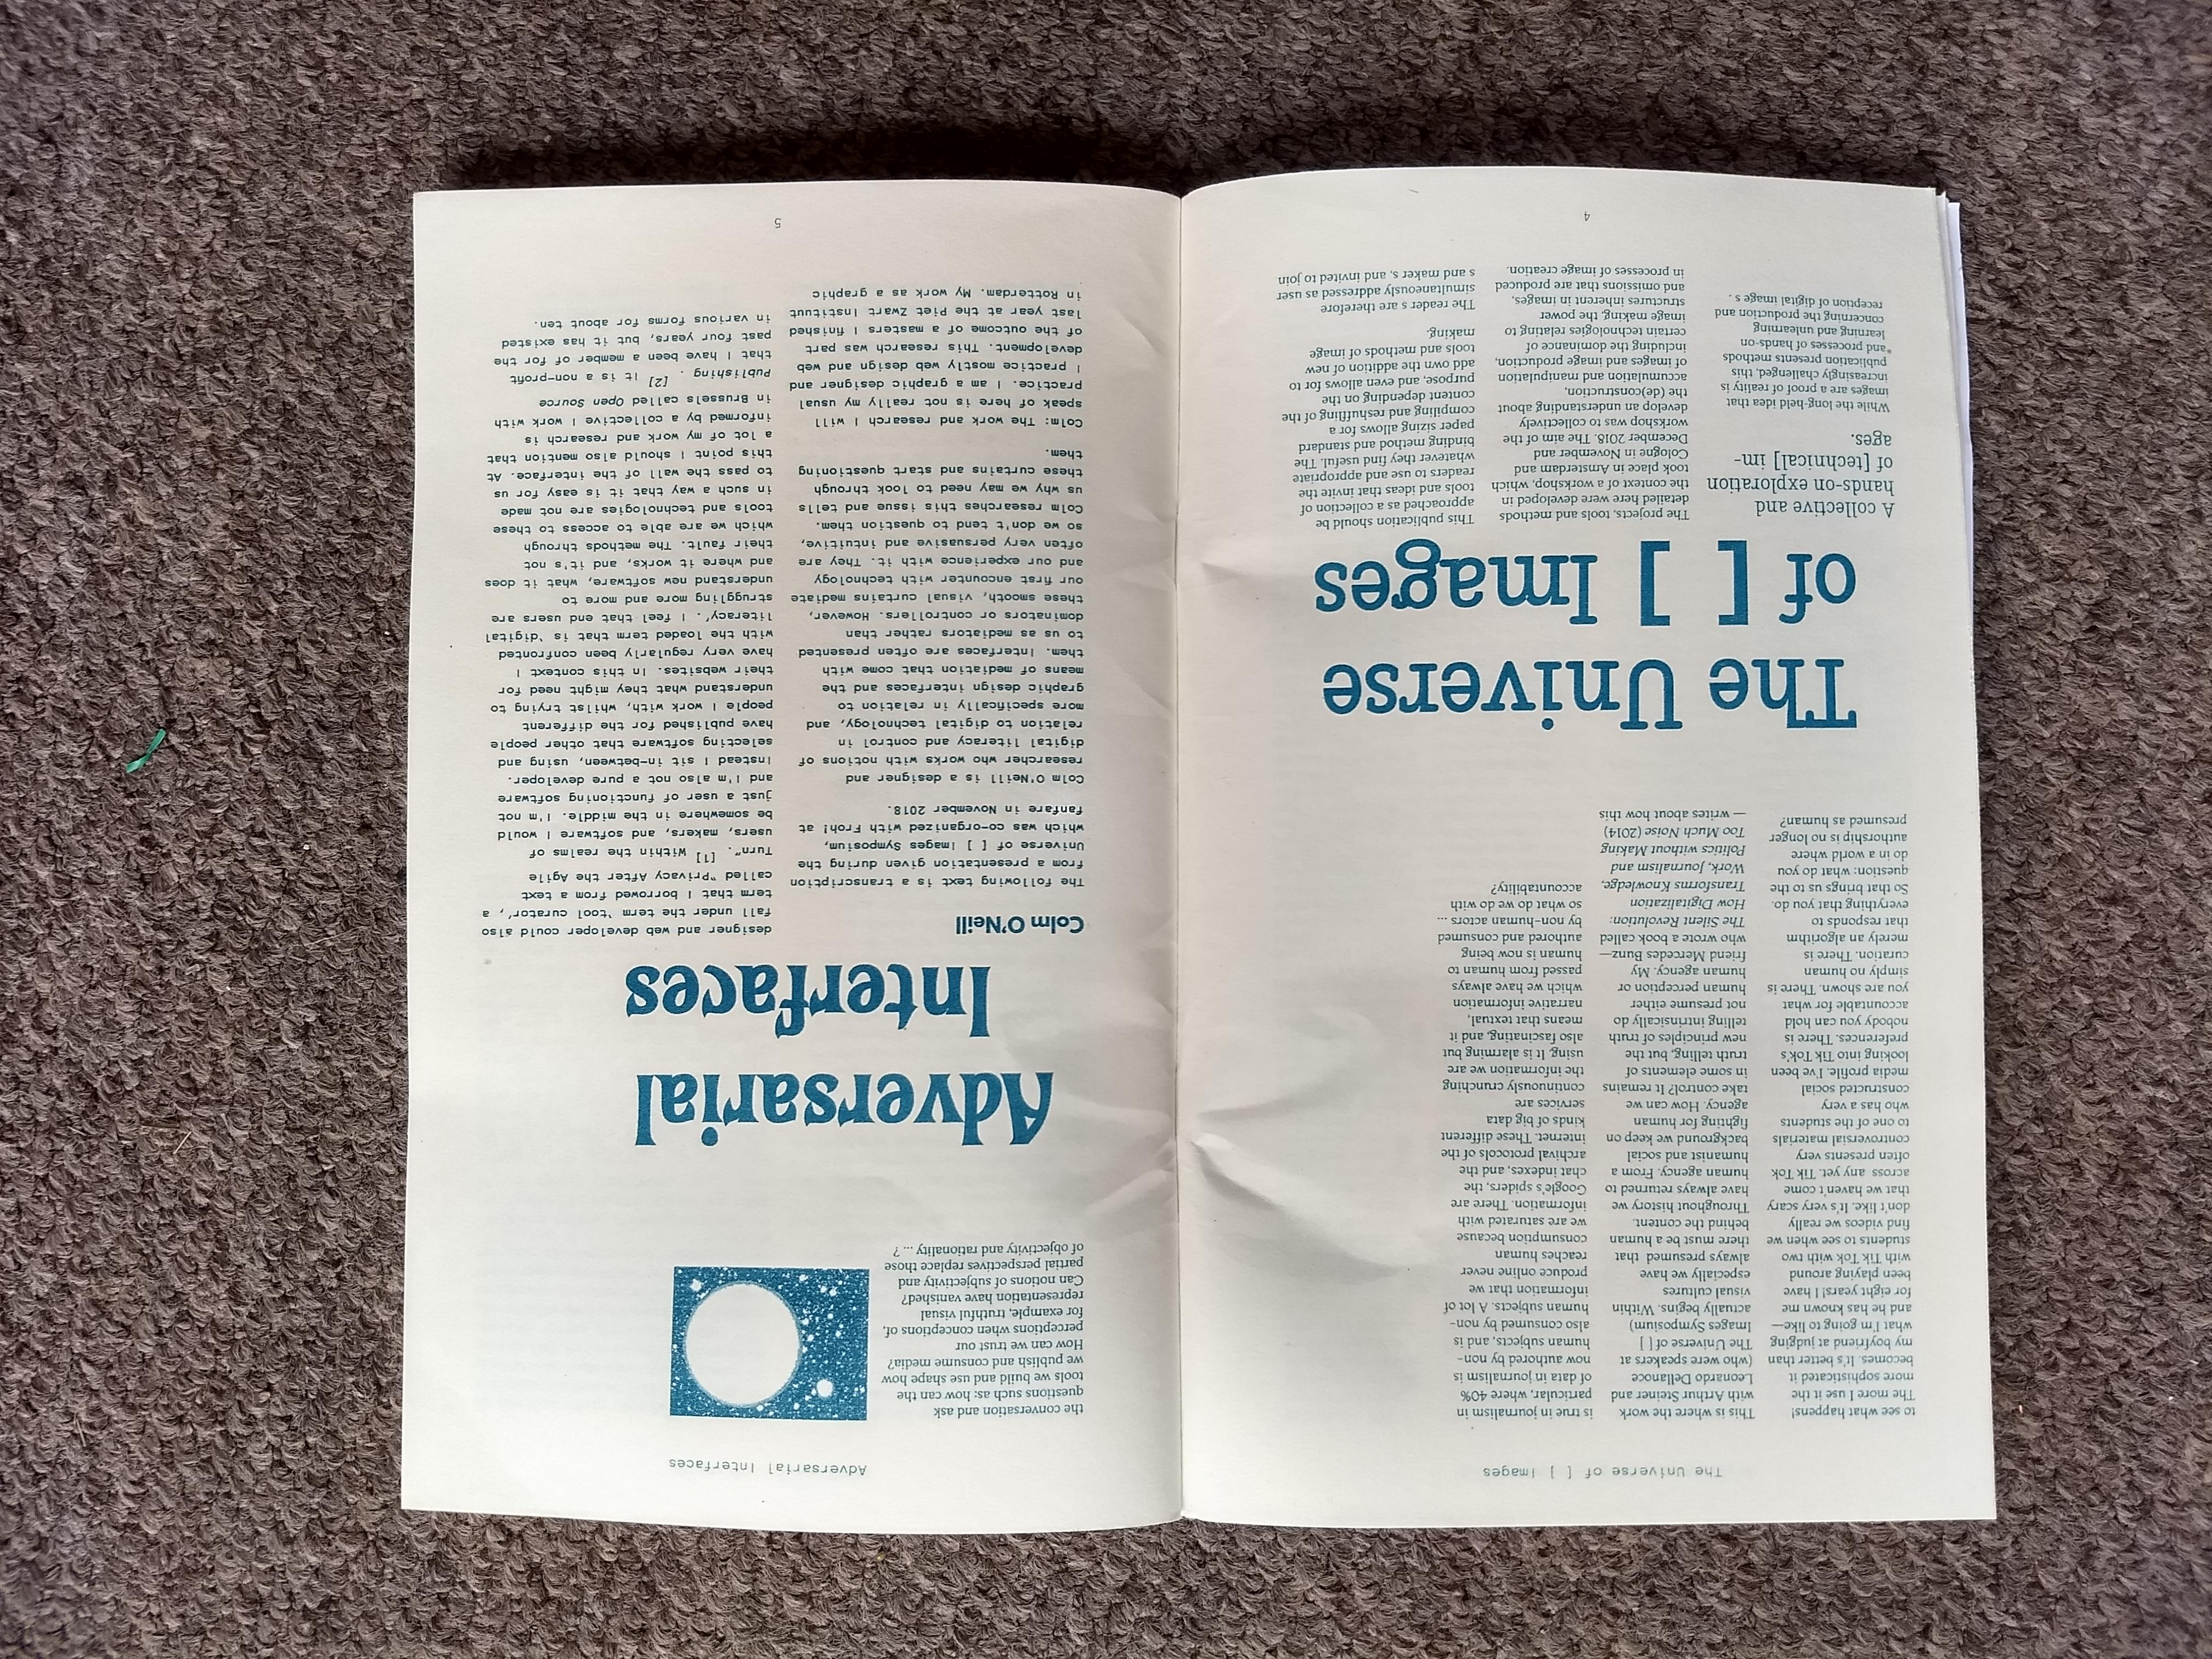 FlaskApp/static/images/samples-of-work/publications/hnd-fake-it6.jpg